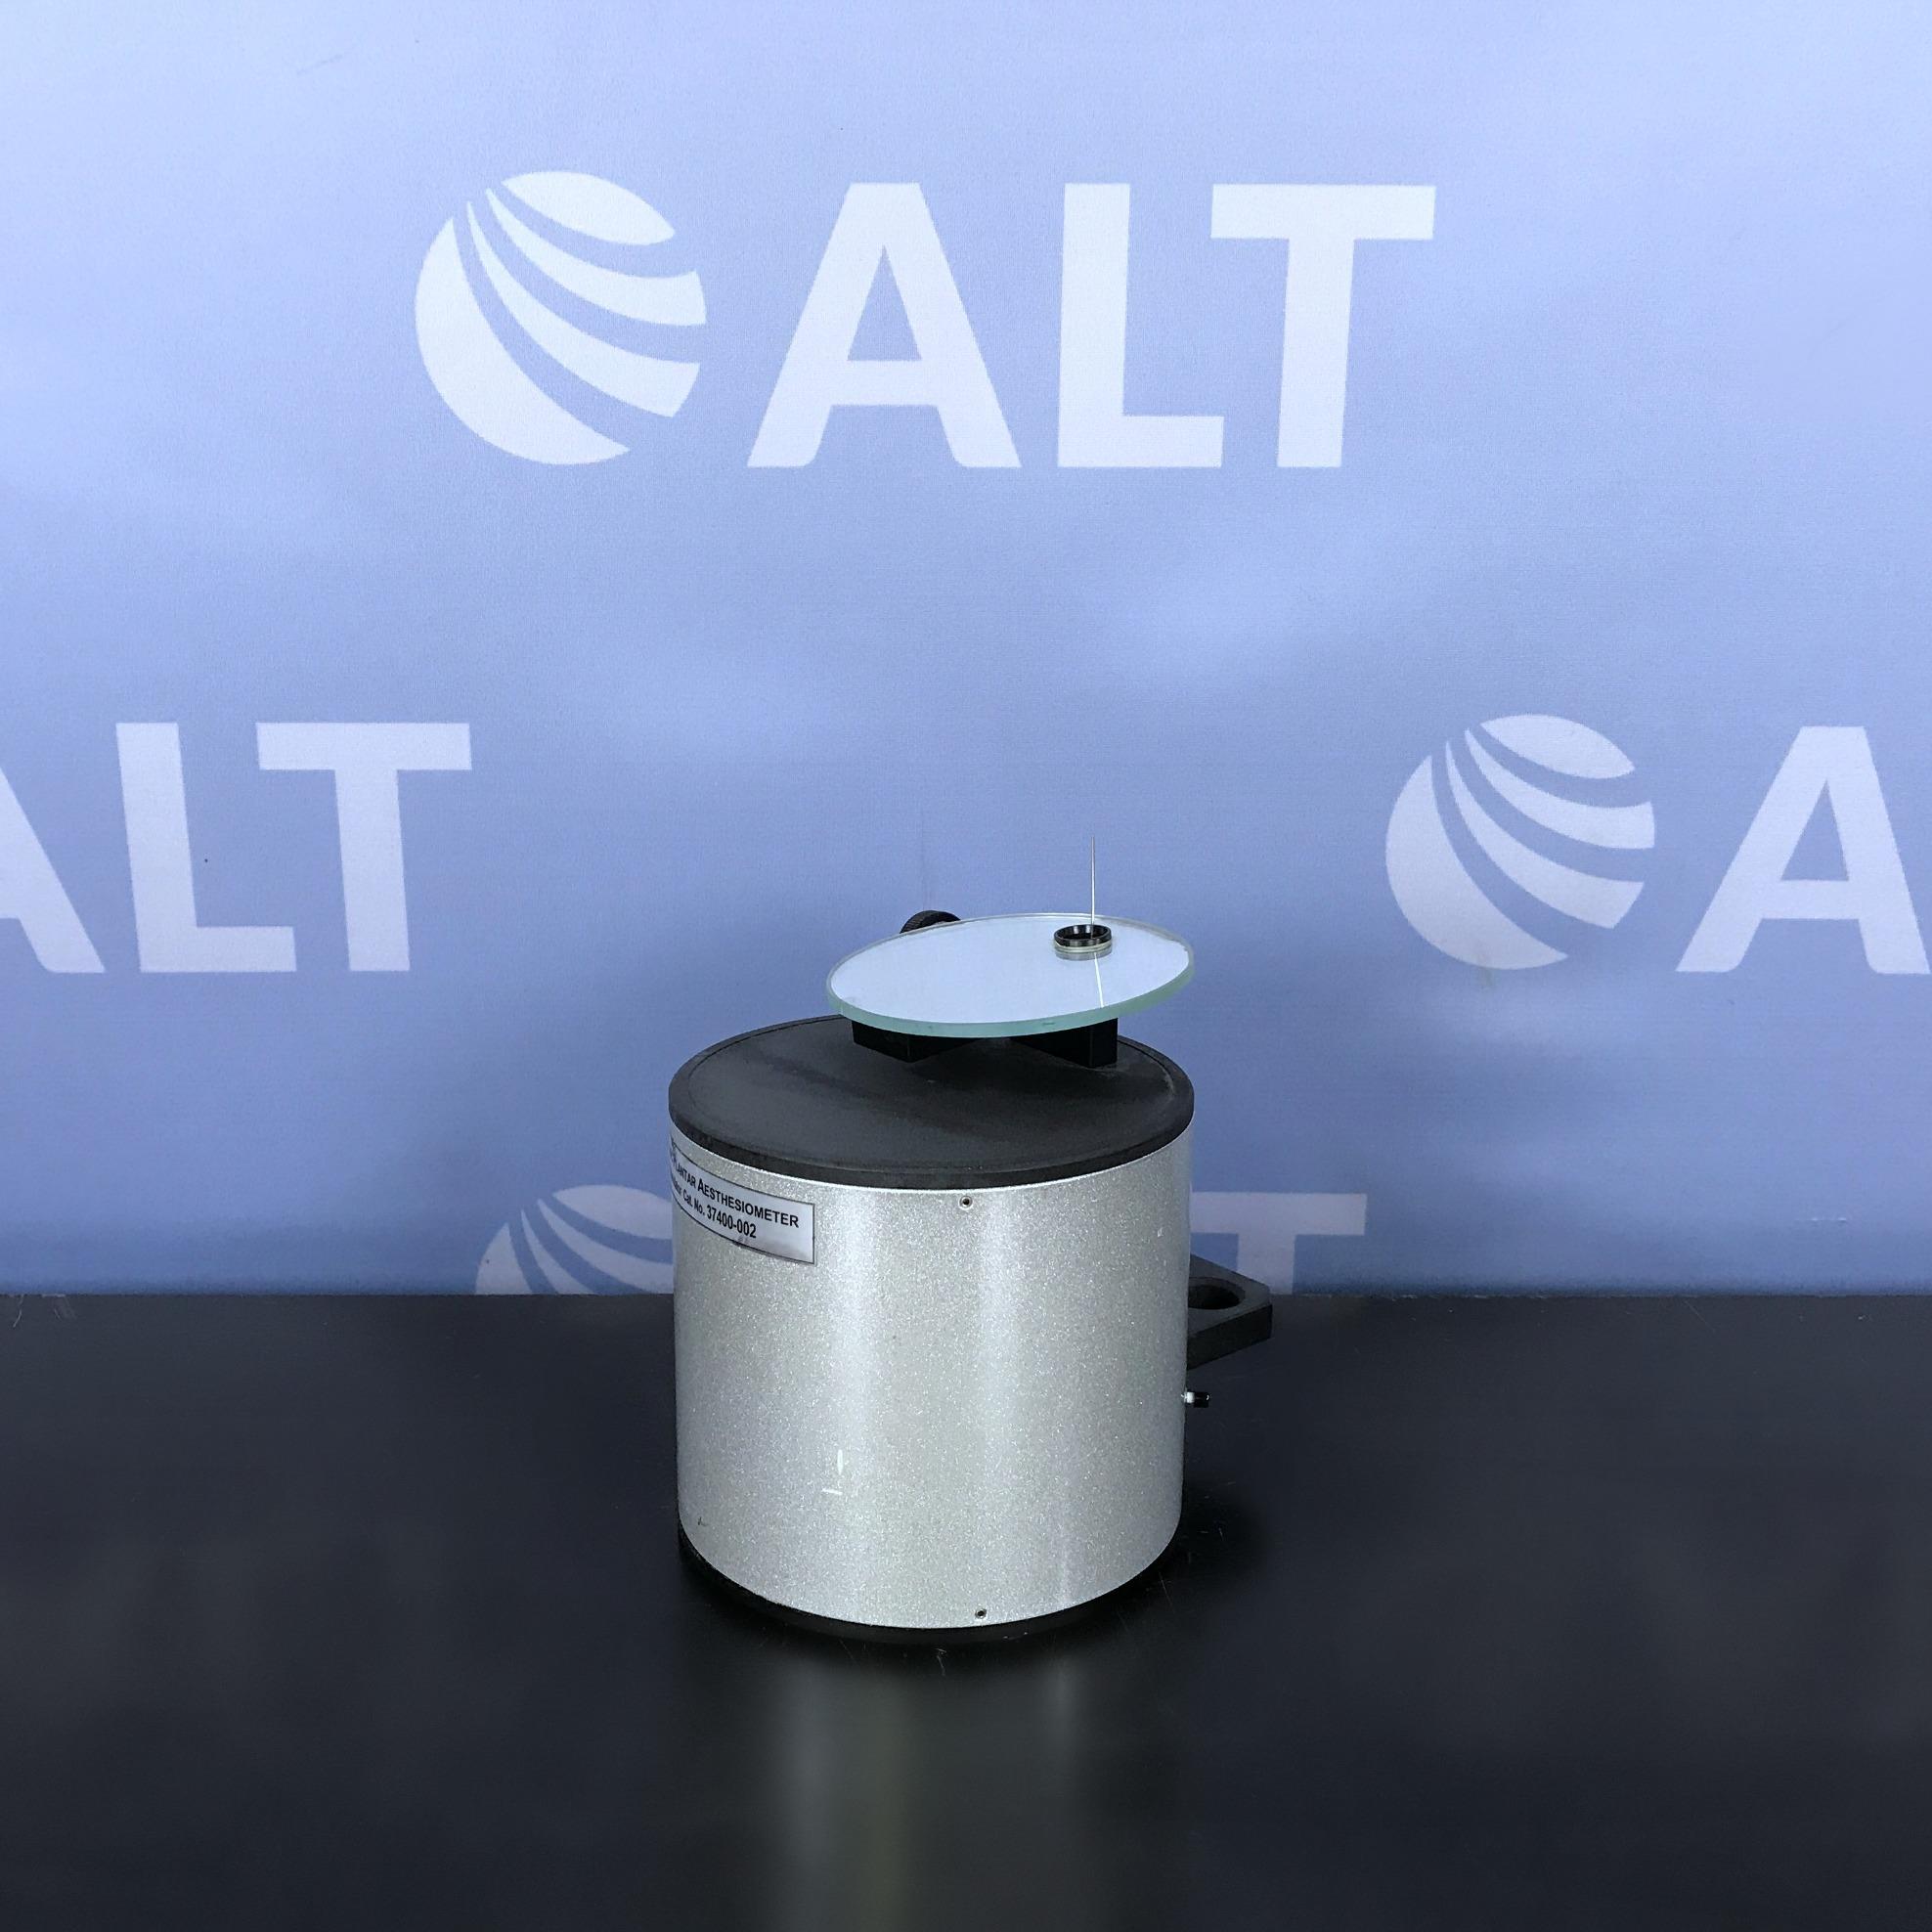 Dynamic Plantar Aesthesiometer (DPA) Touch Stimulator Model 37400-002 Name